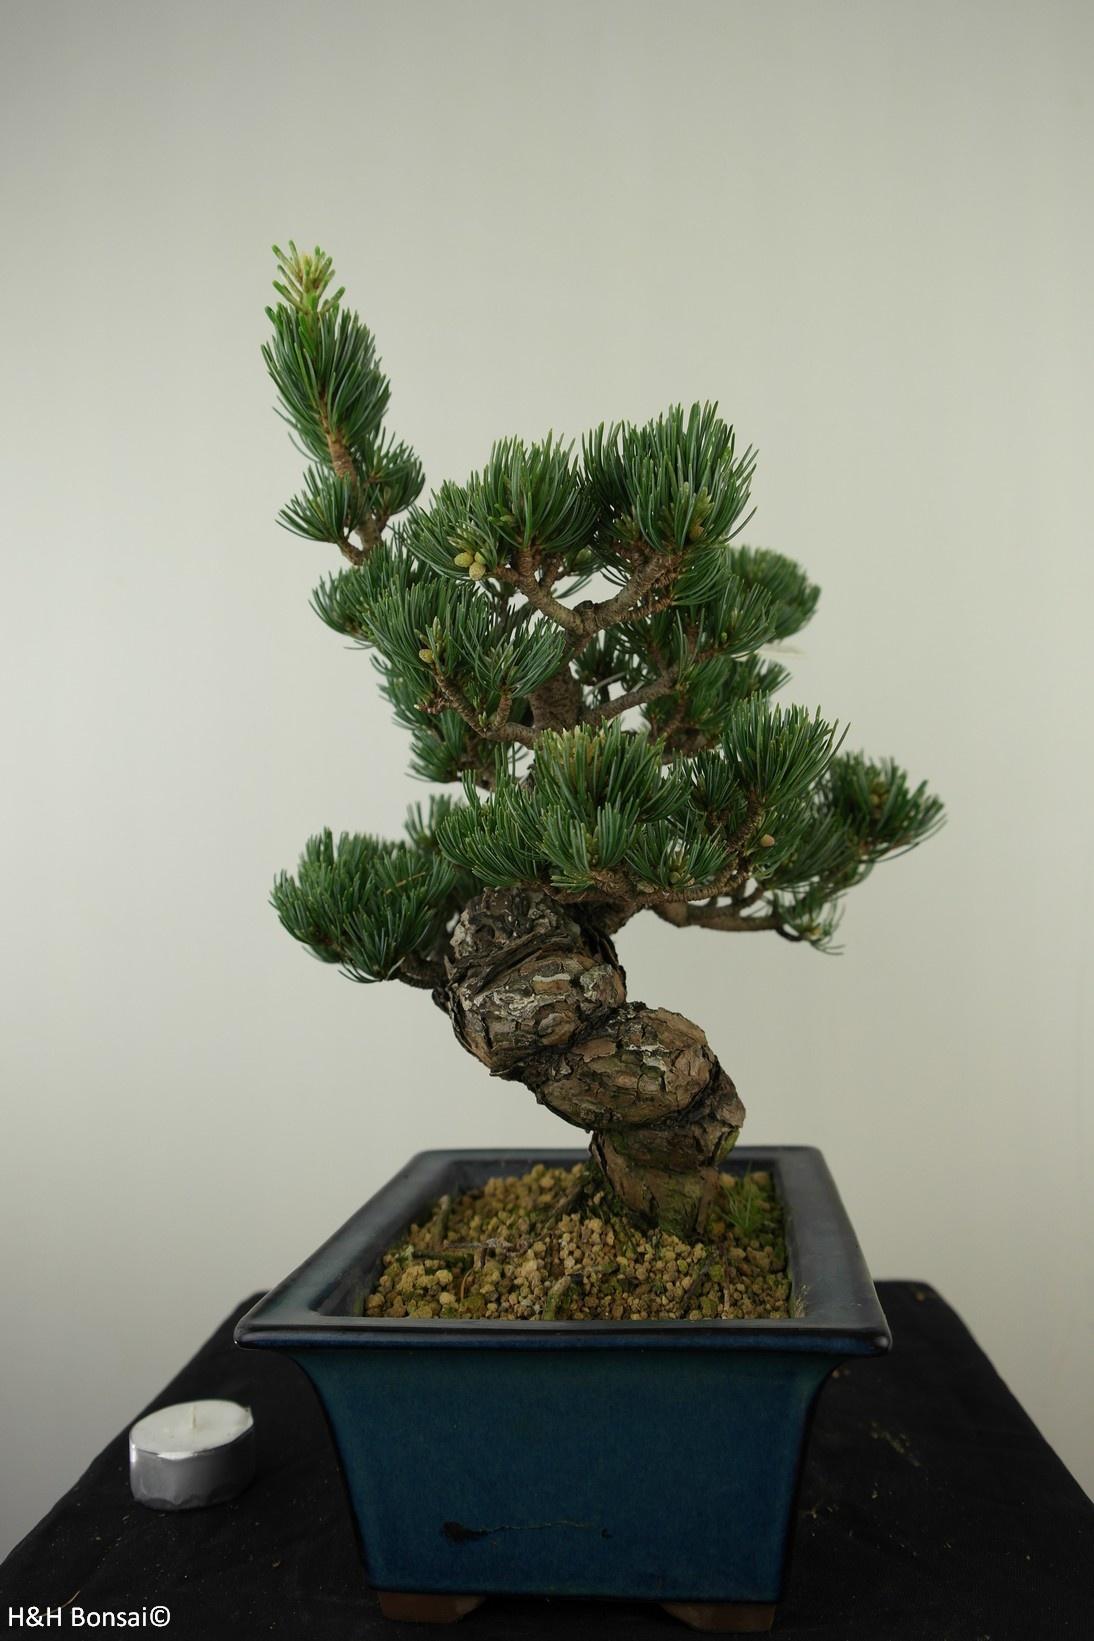 Bonsai Pinus pentaphylla, Japanse witte den, nr. 7811